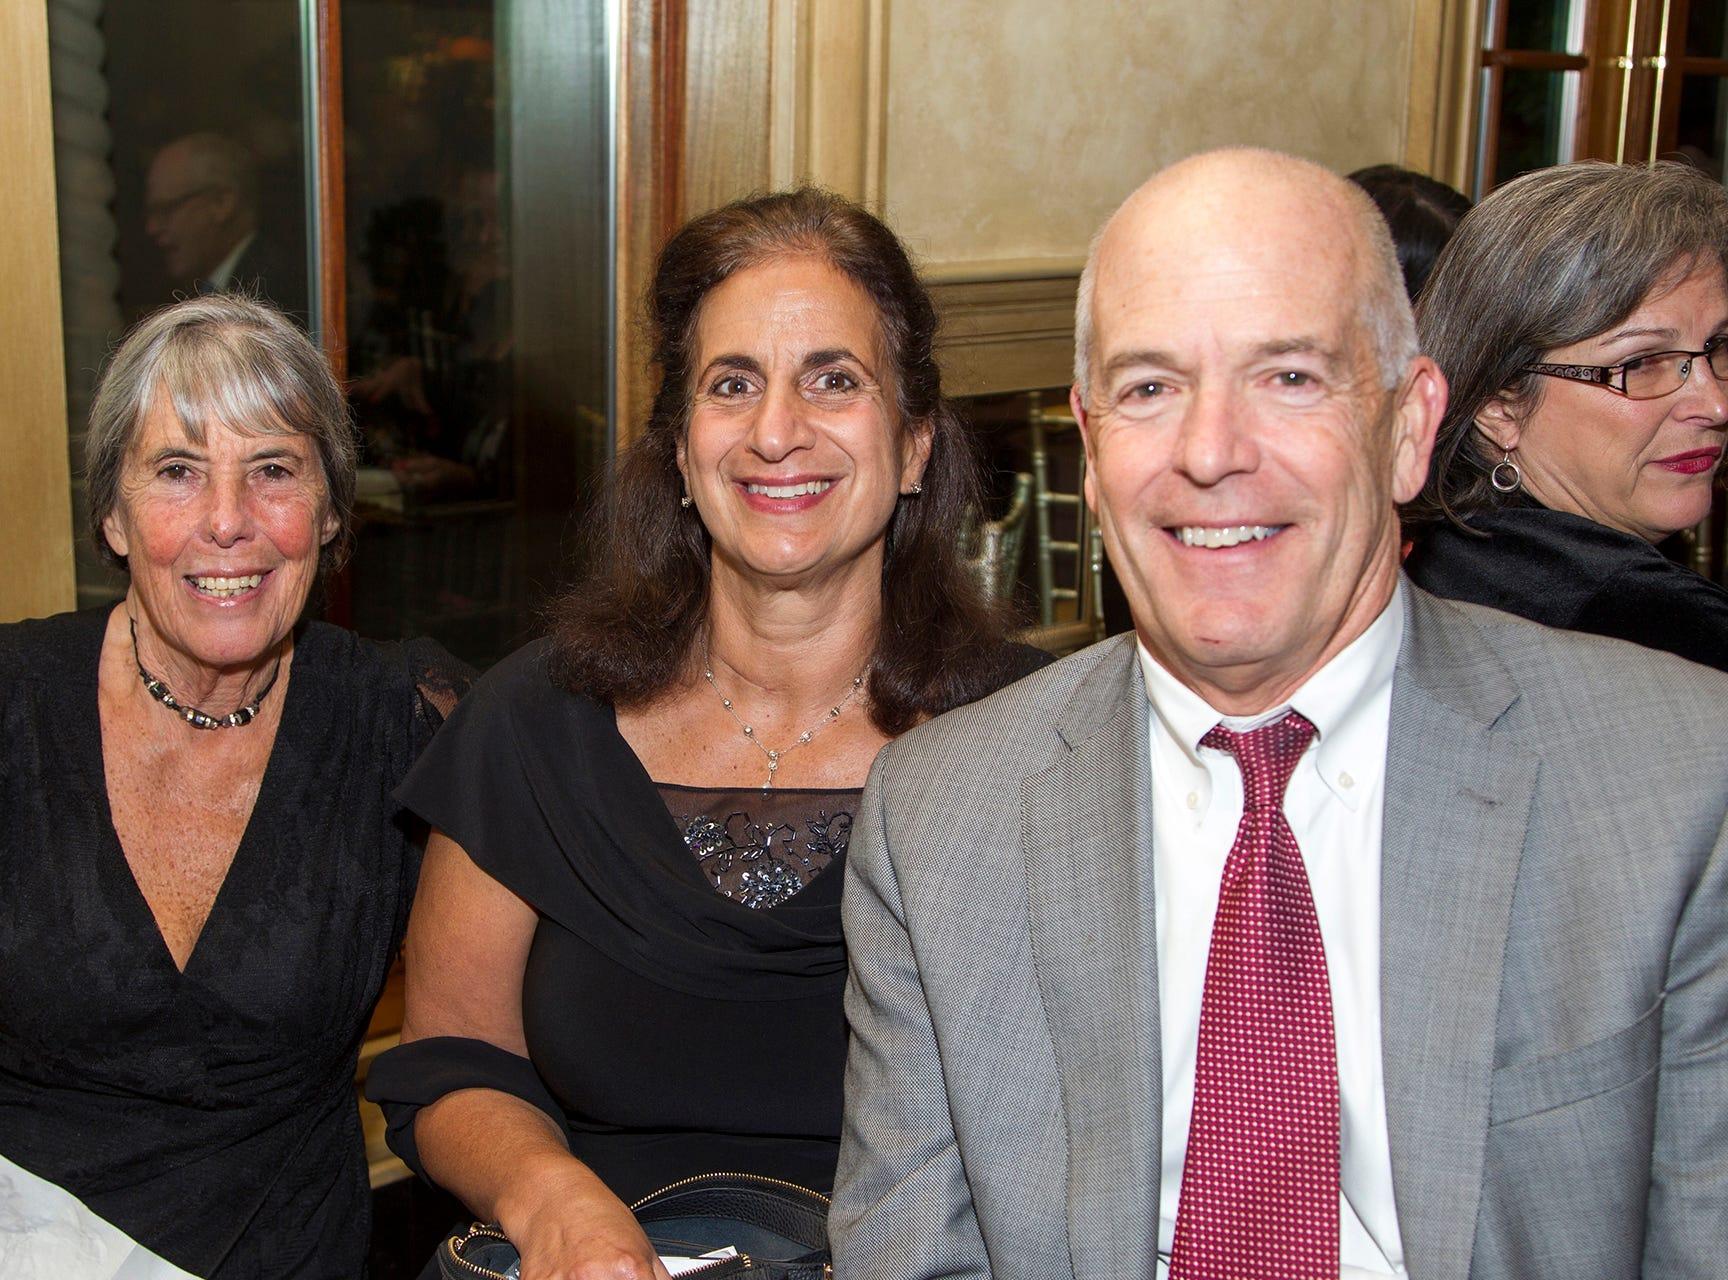 Joy Vottero, Joyce Kwiatkowski, Kevin Cornwell.  Christian Health Care Center held its ' A Celebration of Excellence' gala at the Venetian in Garfield.  10/17/2018